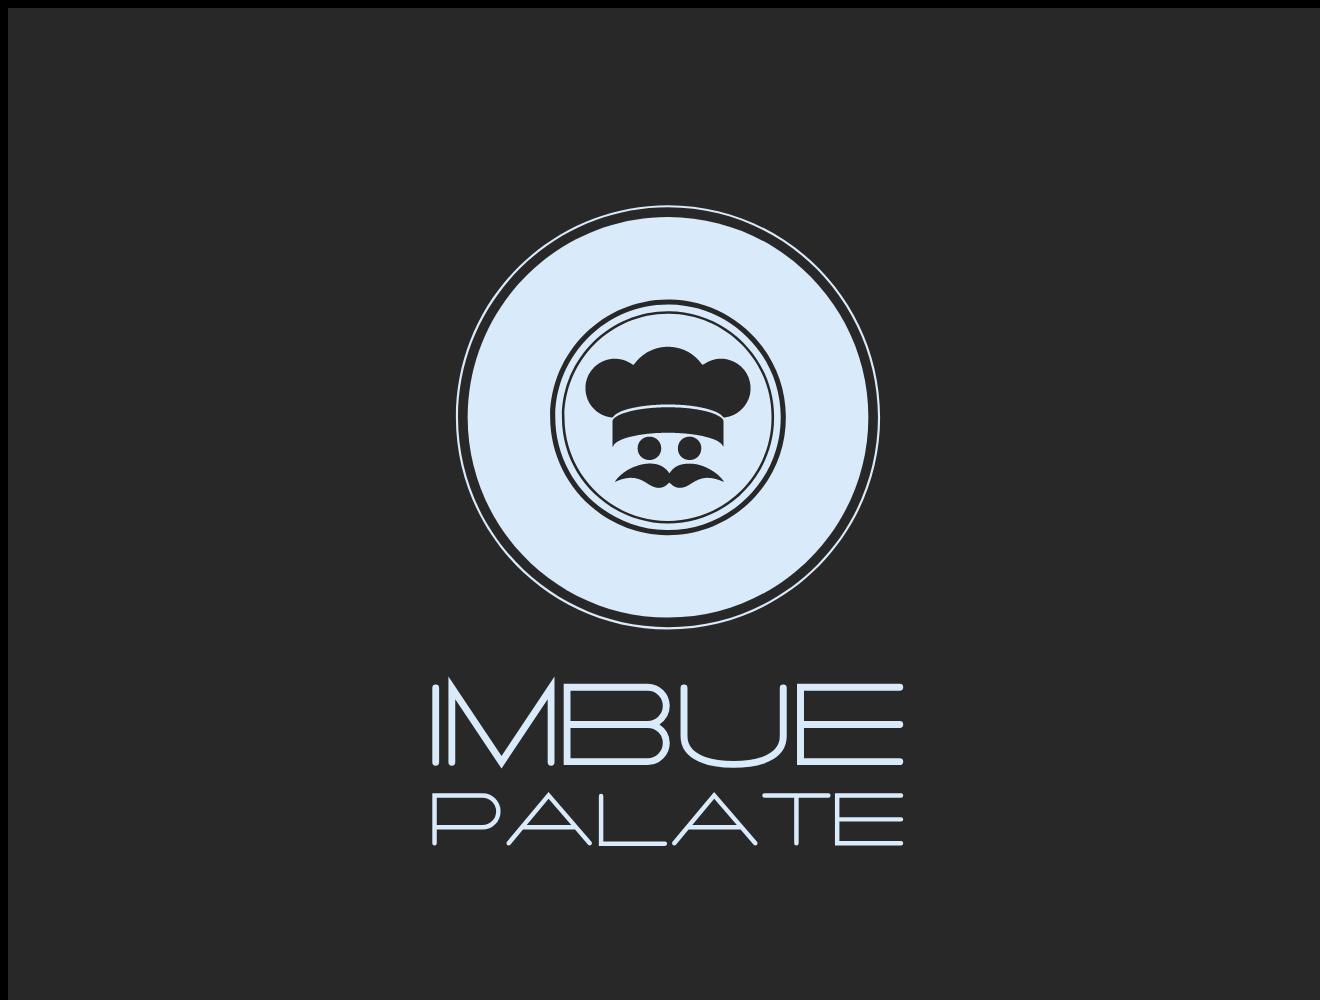 Imbuepalate.com